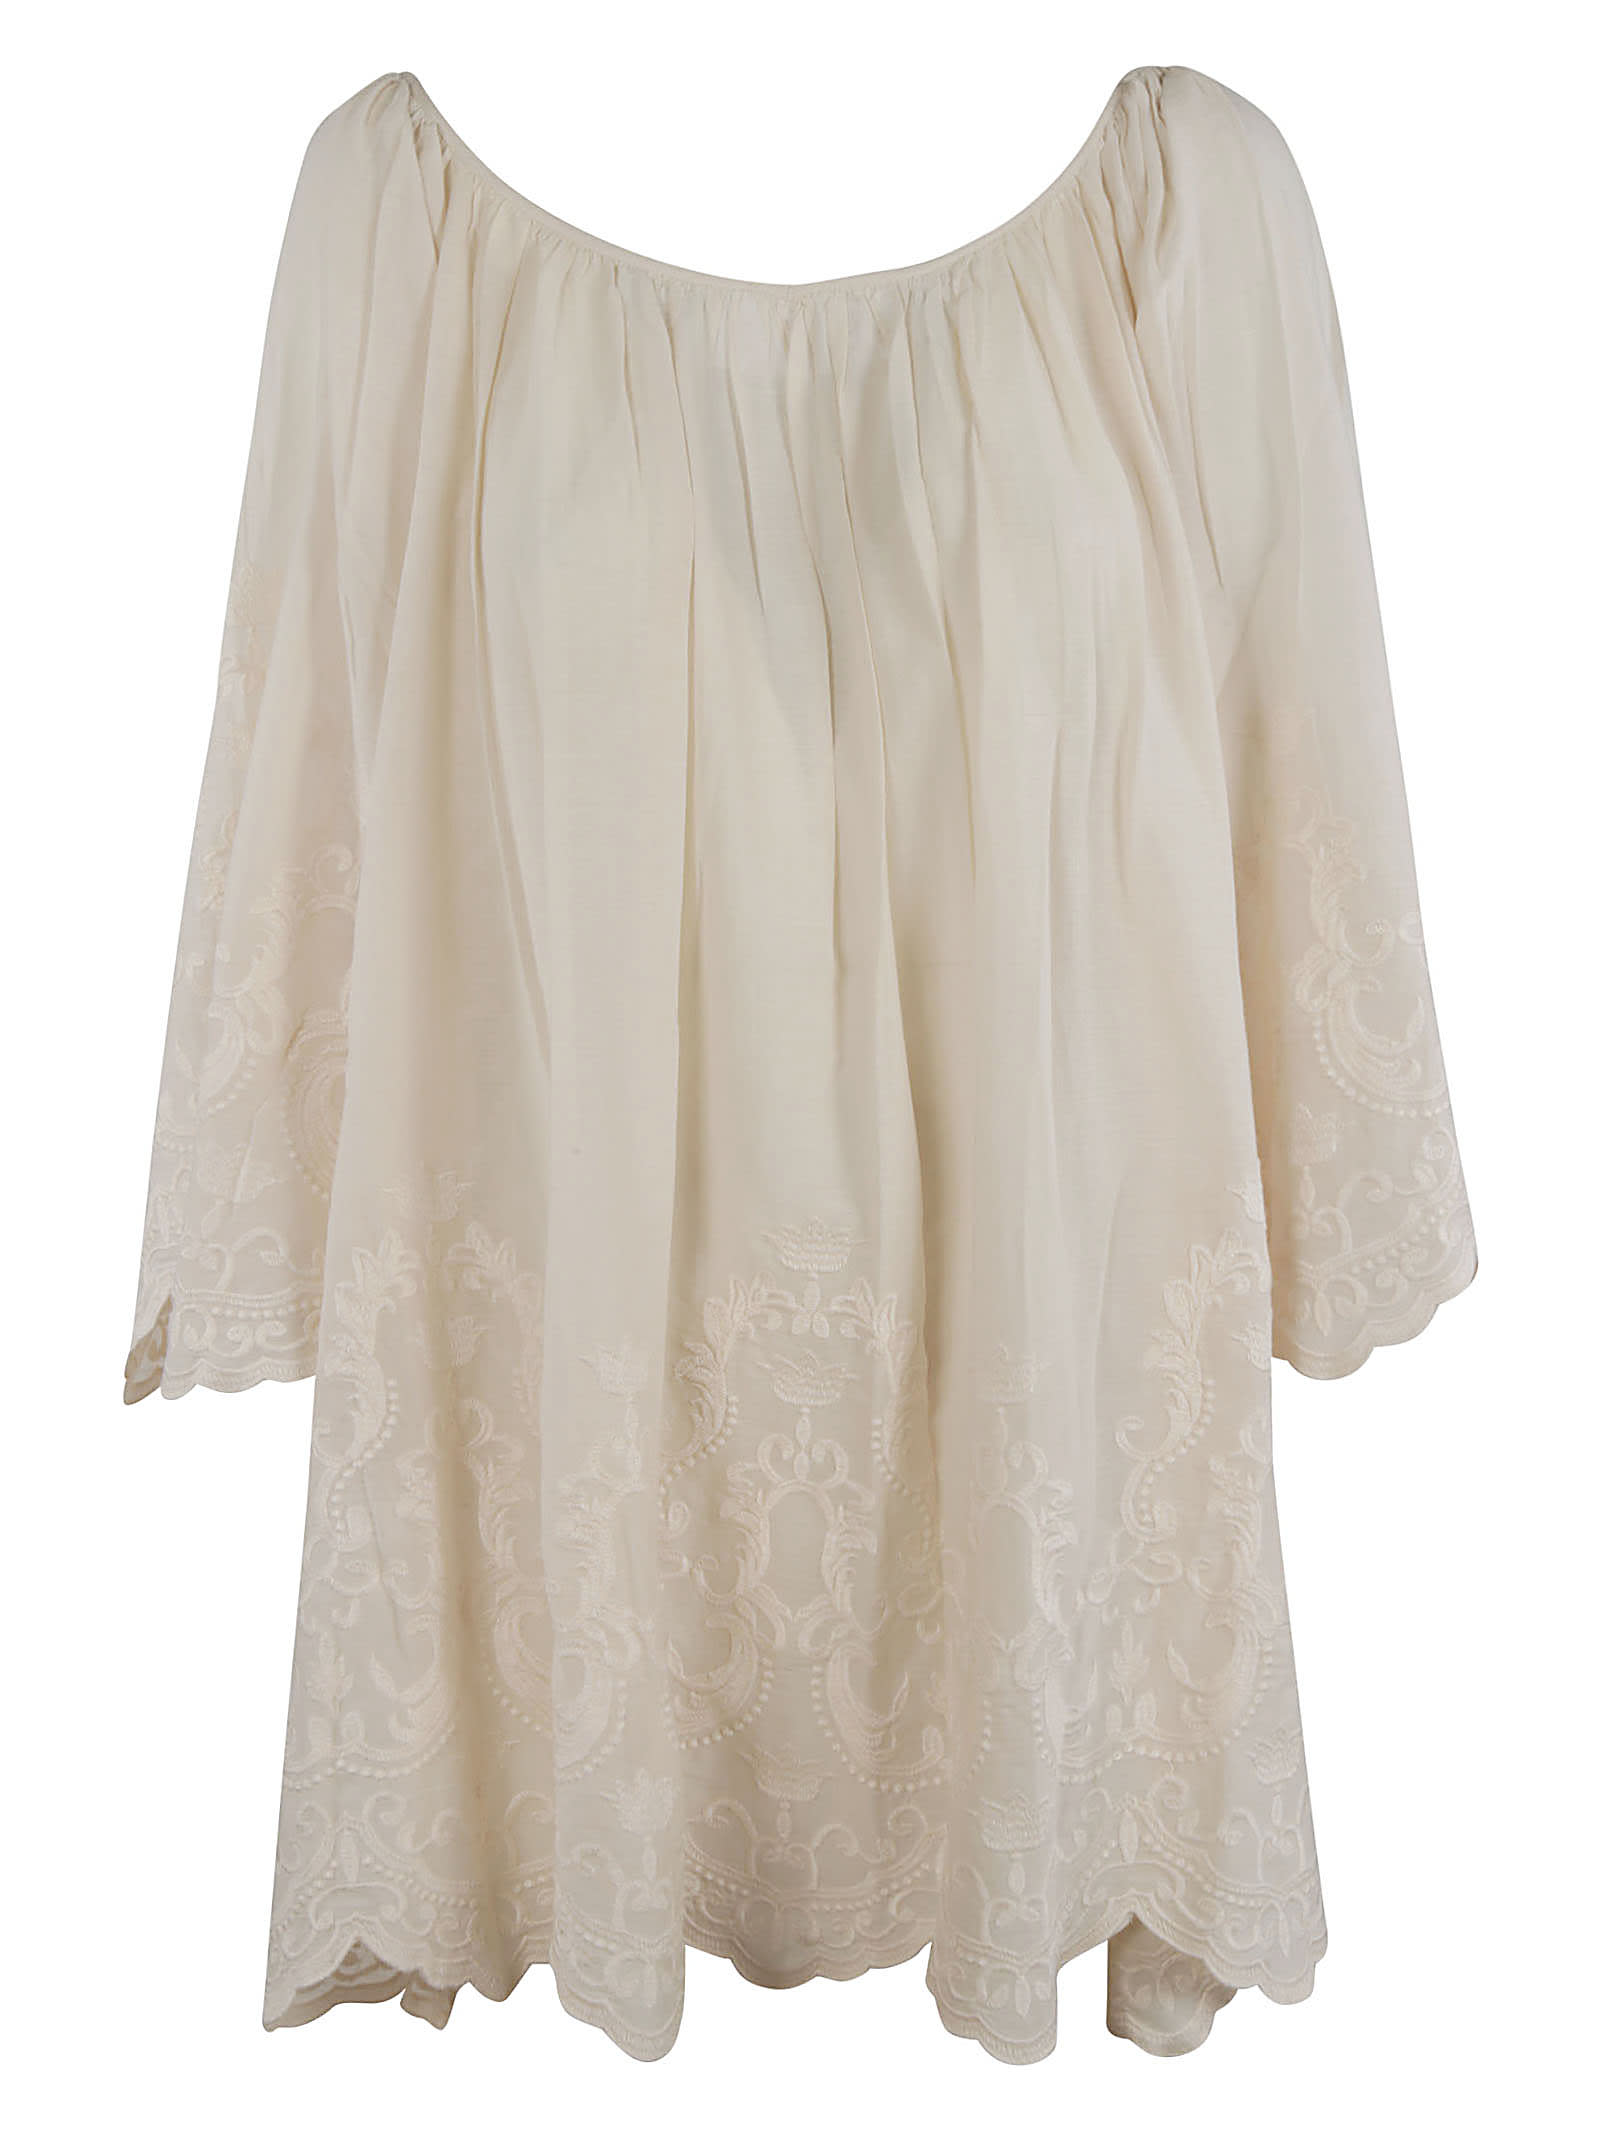 Mes Demoiselles Beaurevoir Long Dress